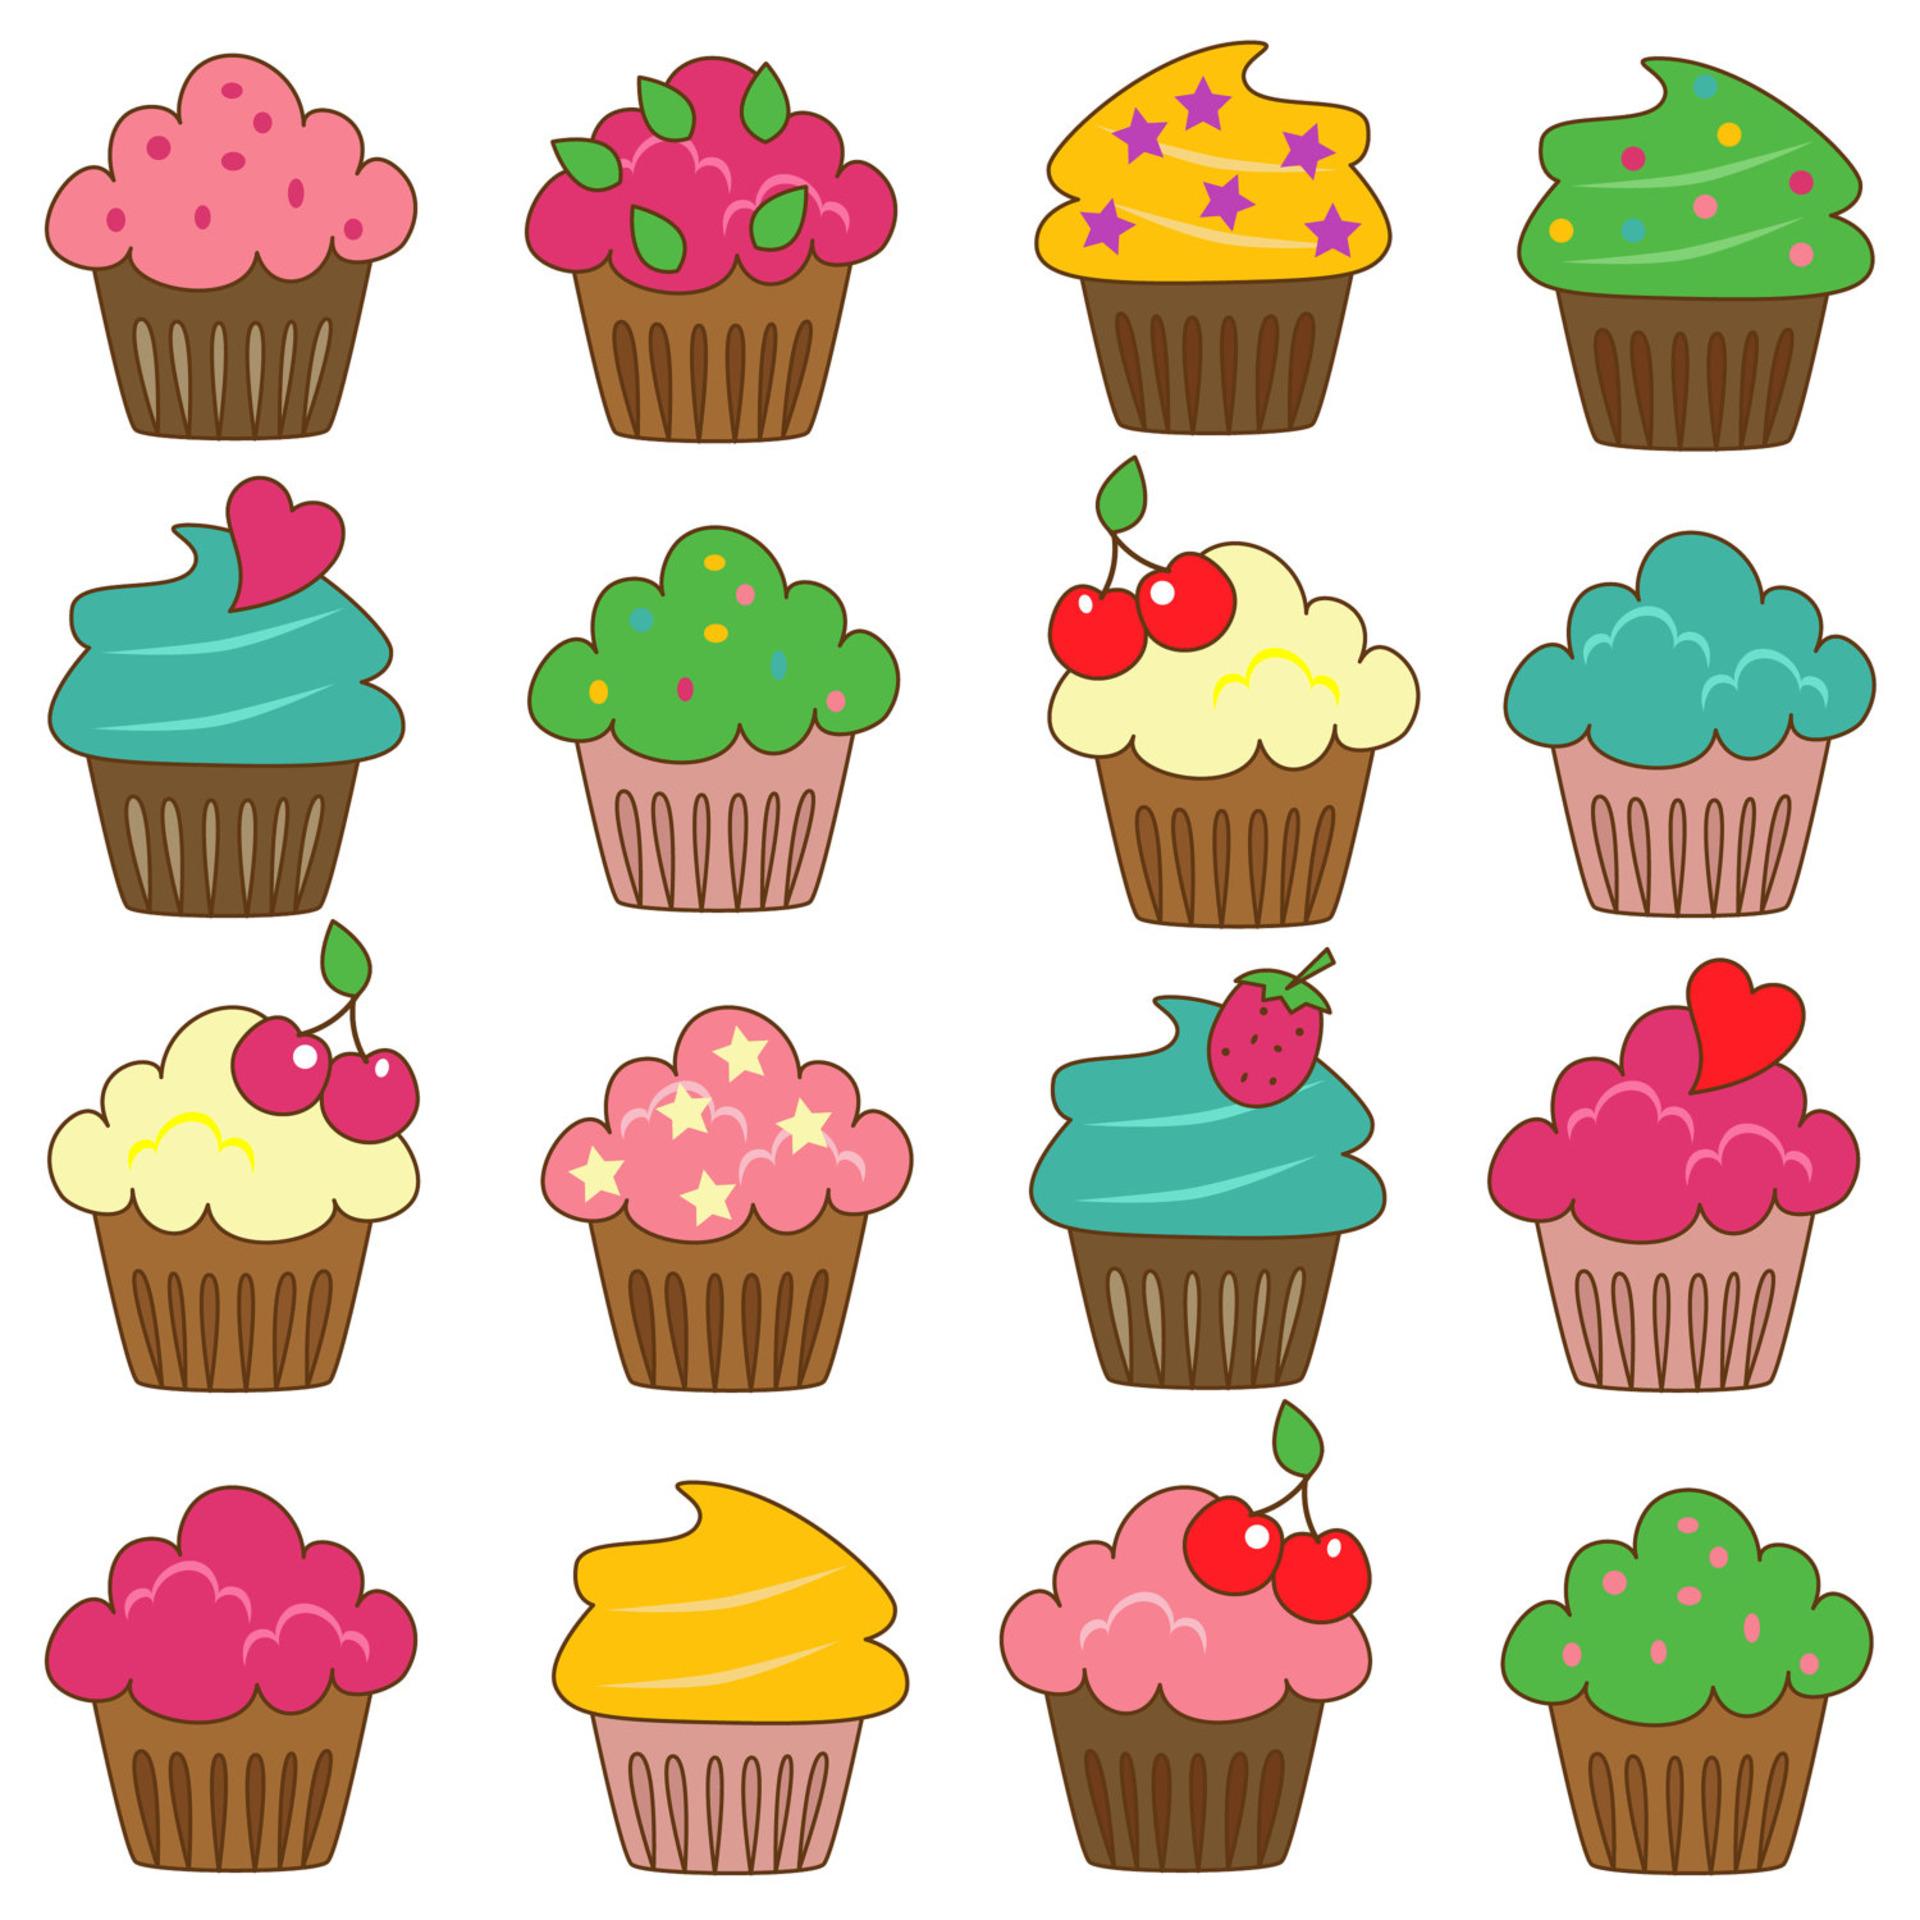 Vanilla Cupcake clipart cookie cupcake Cookies Vs Topic Cupcakes Cookies